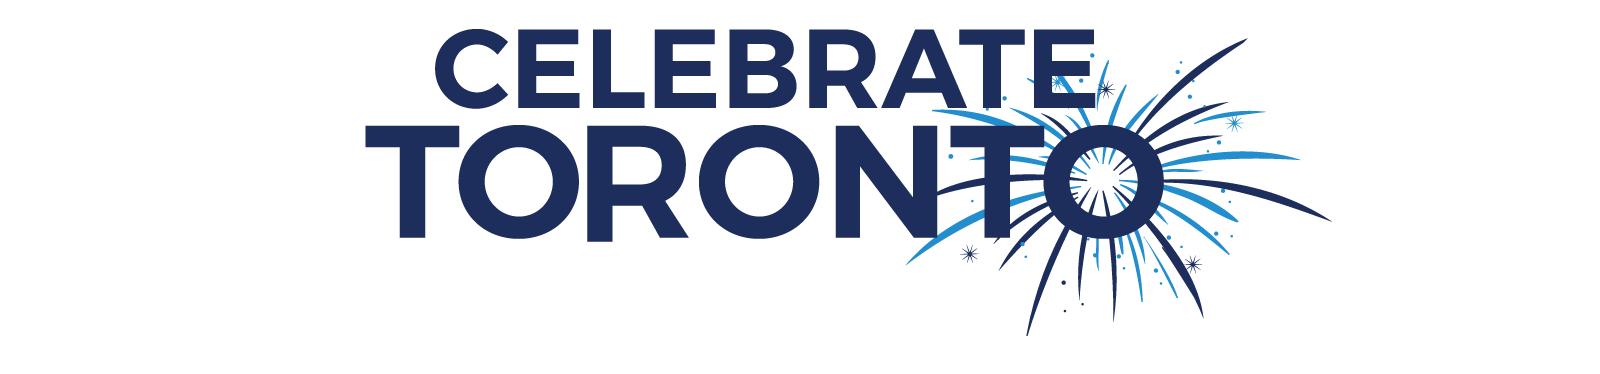 CelebrateToronto.png